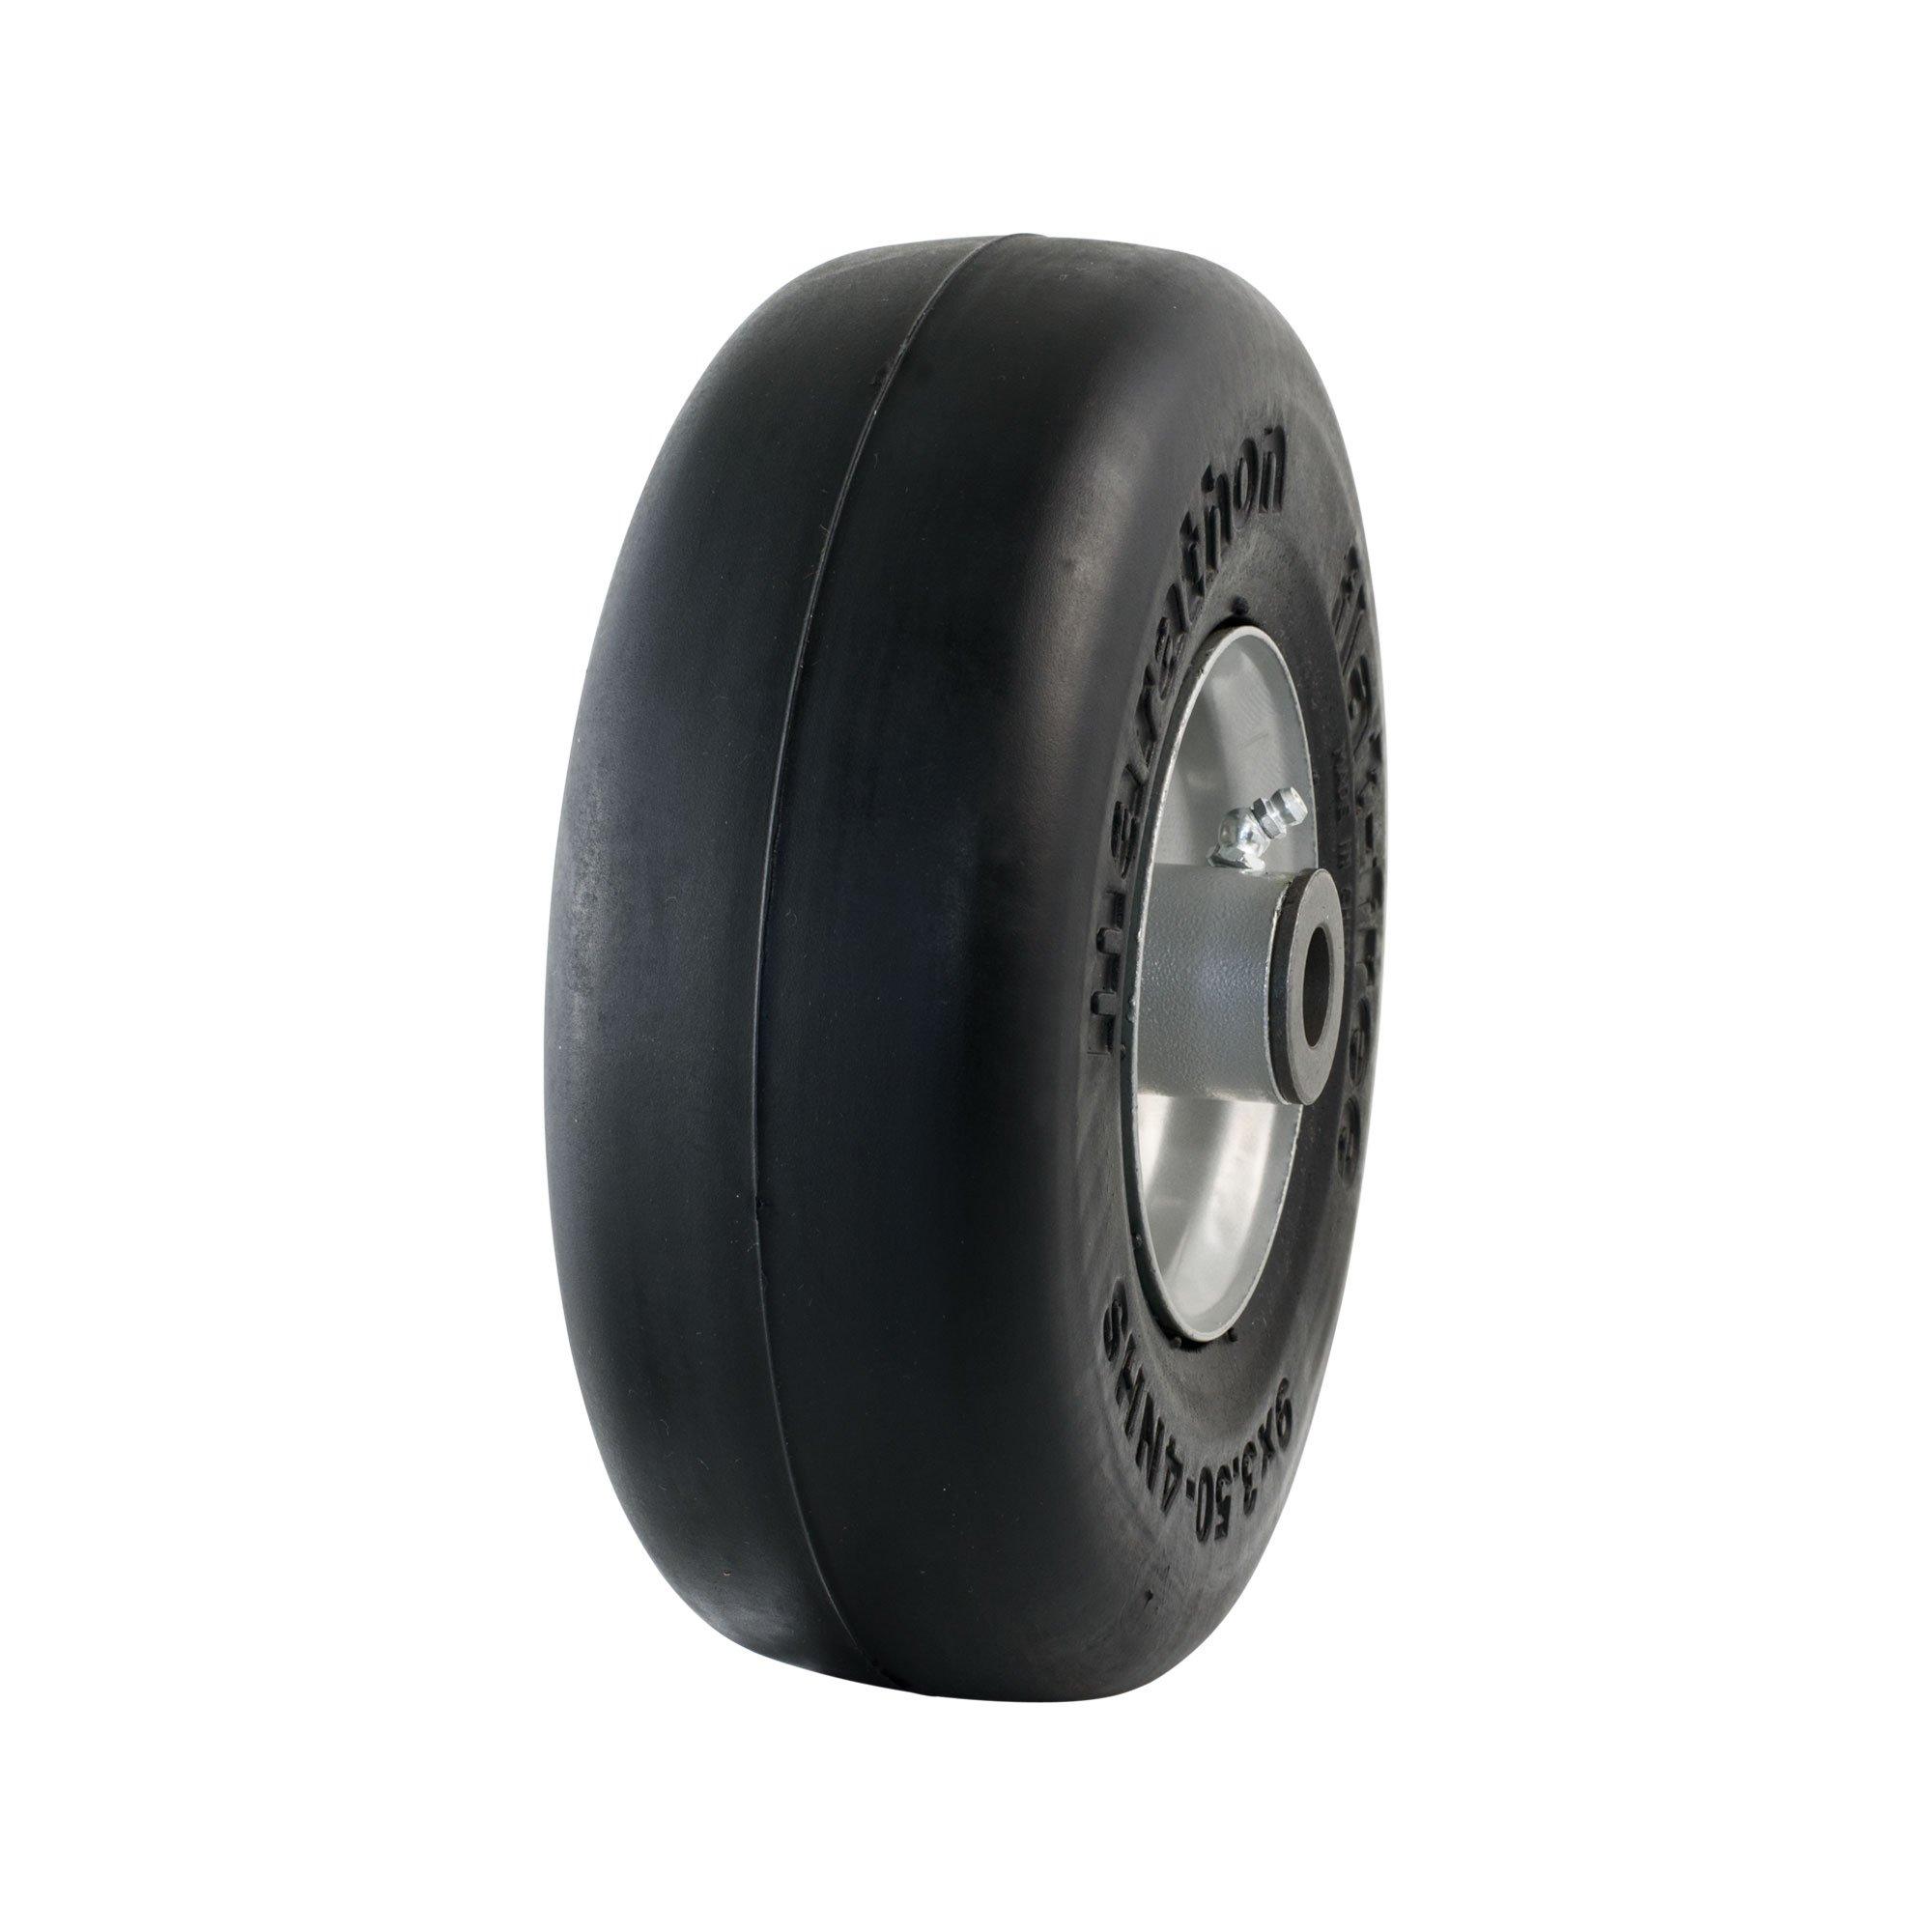 Marathon 9x3.50-4'' Flat Free Tire on Wheel, 4'' Centered Hub, 3/4'' Bushings